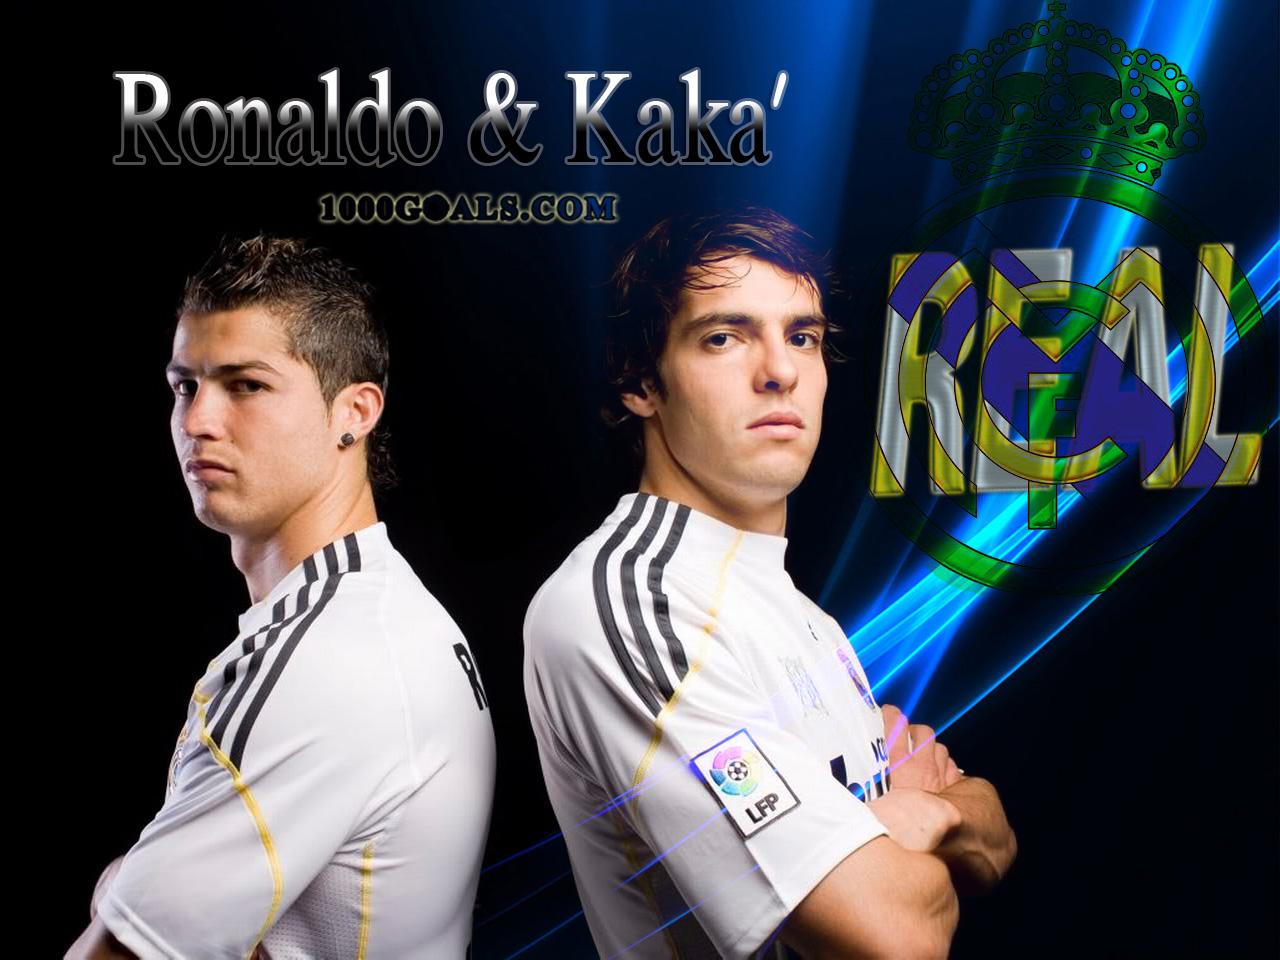 http://1.bp.blogspot.com/-5-_DxXsY8PU/TWIljMyXZCI/AAAAAAAAAC0/eLTNZ6PbRCs/s1600/Real+Madrid+Cristiano+Ronaldo+%2526+Kaka+Football+Players.jpg